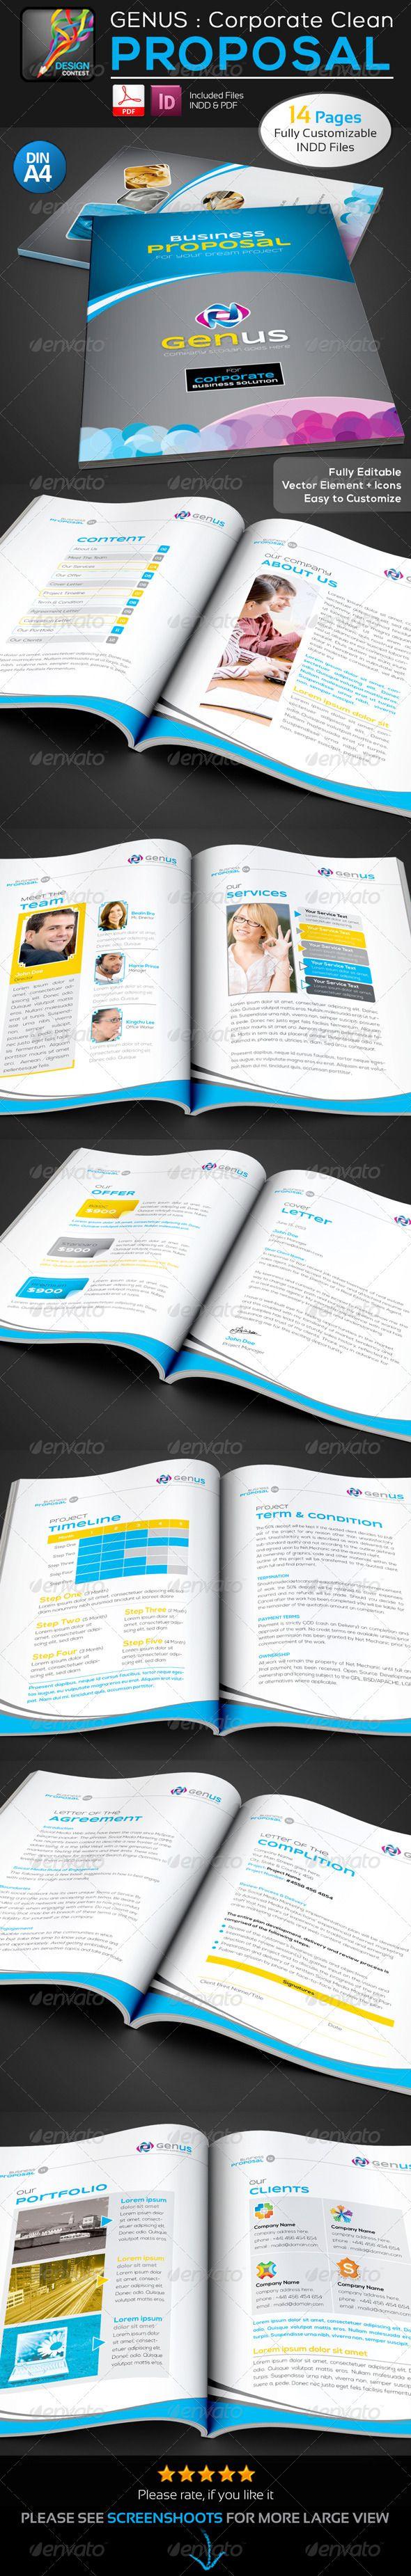 GENUS Corporate Clean Creative Business Proposal